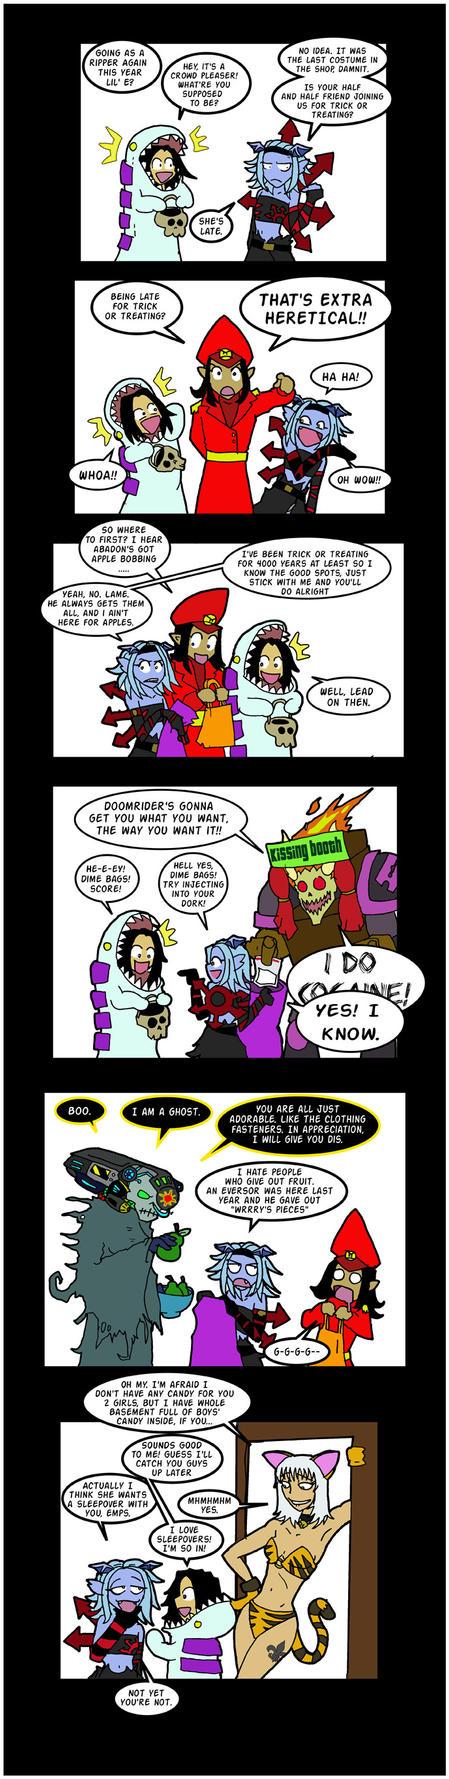 Heresy or Treat by Mr-Culexus